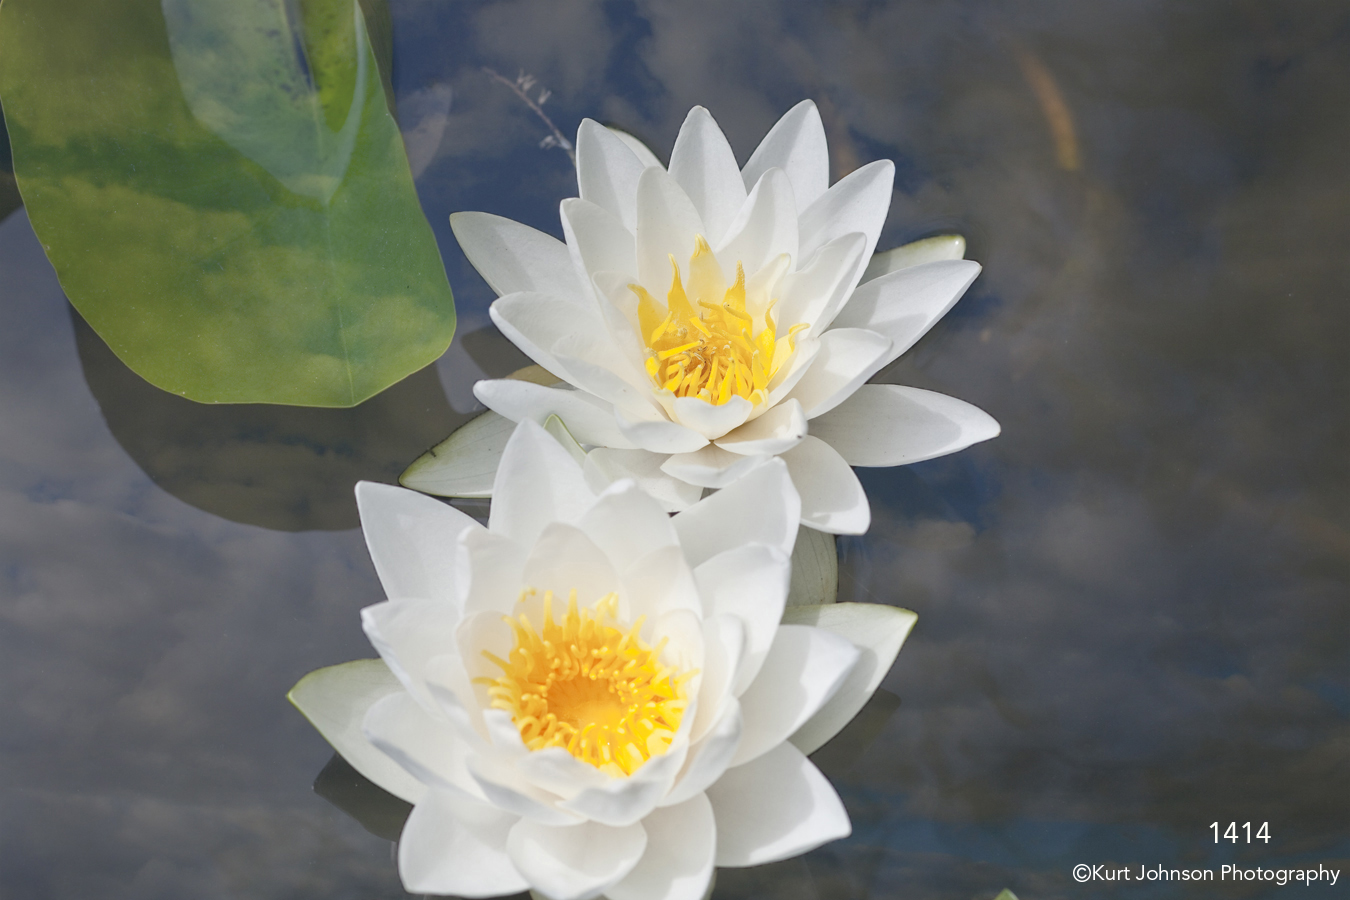 interpretations interpretation filter clouds white flower lily leaf flowers water